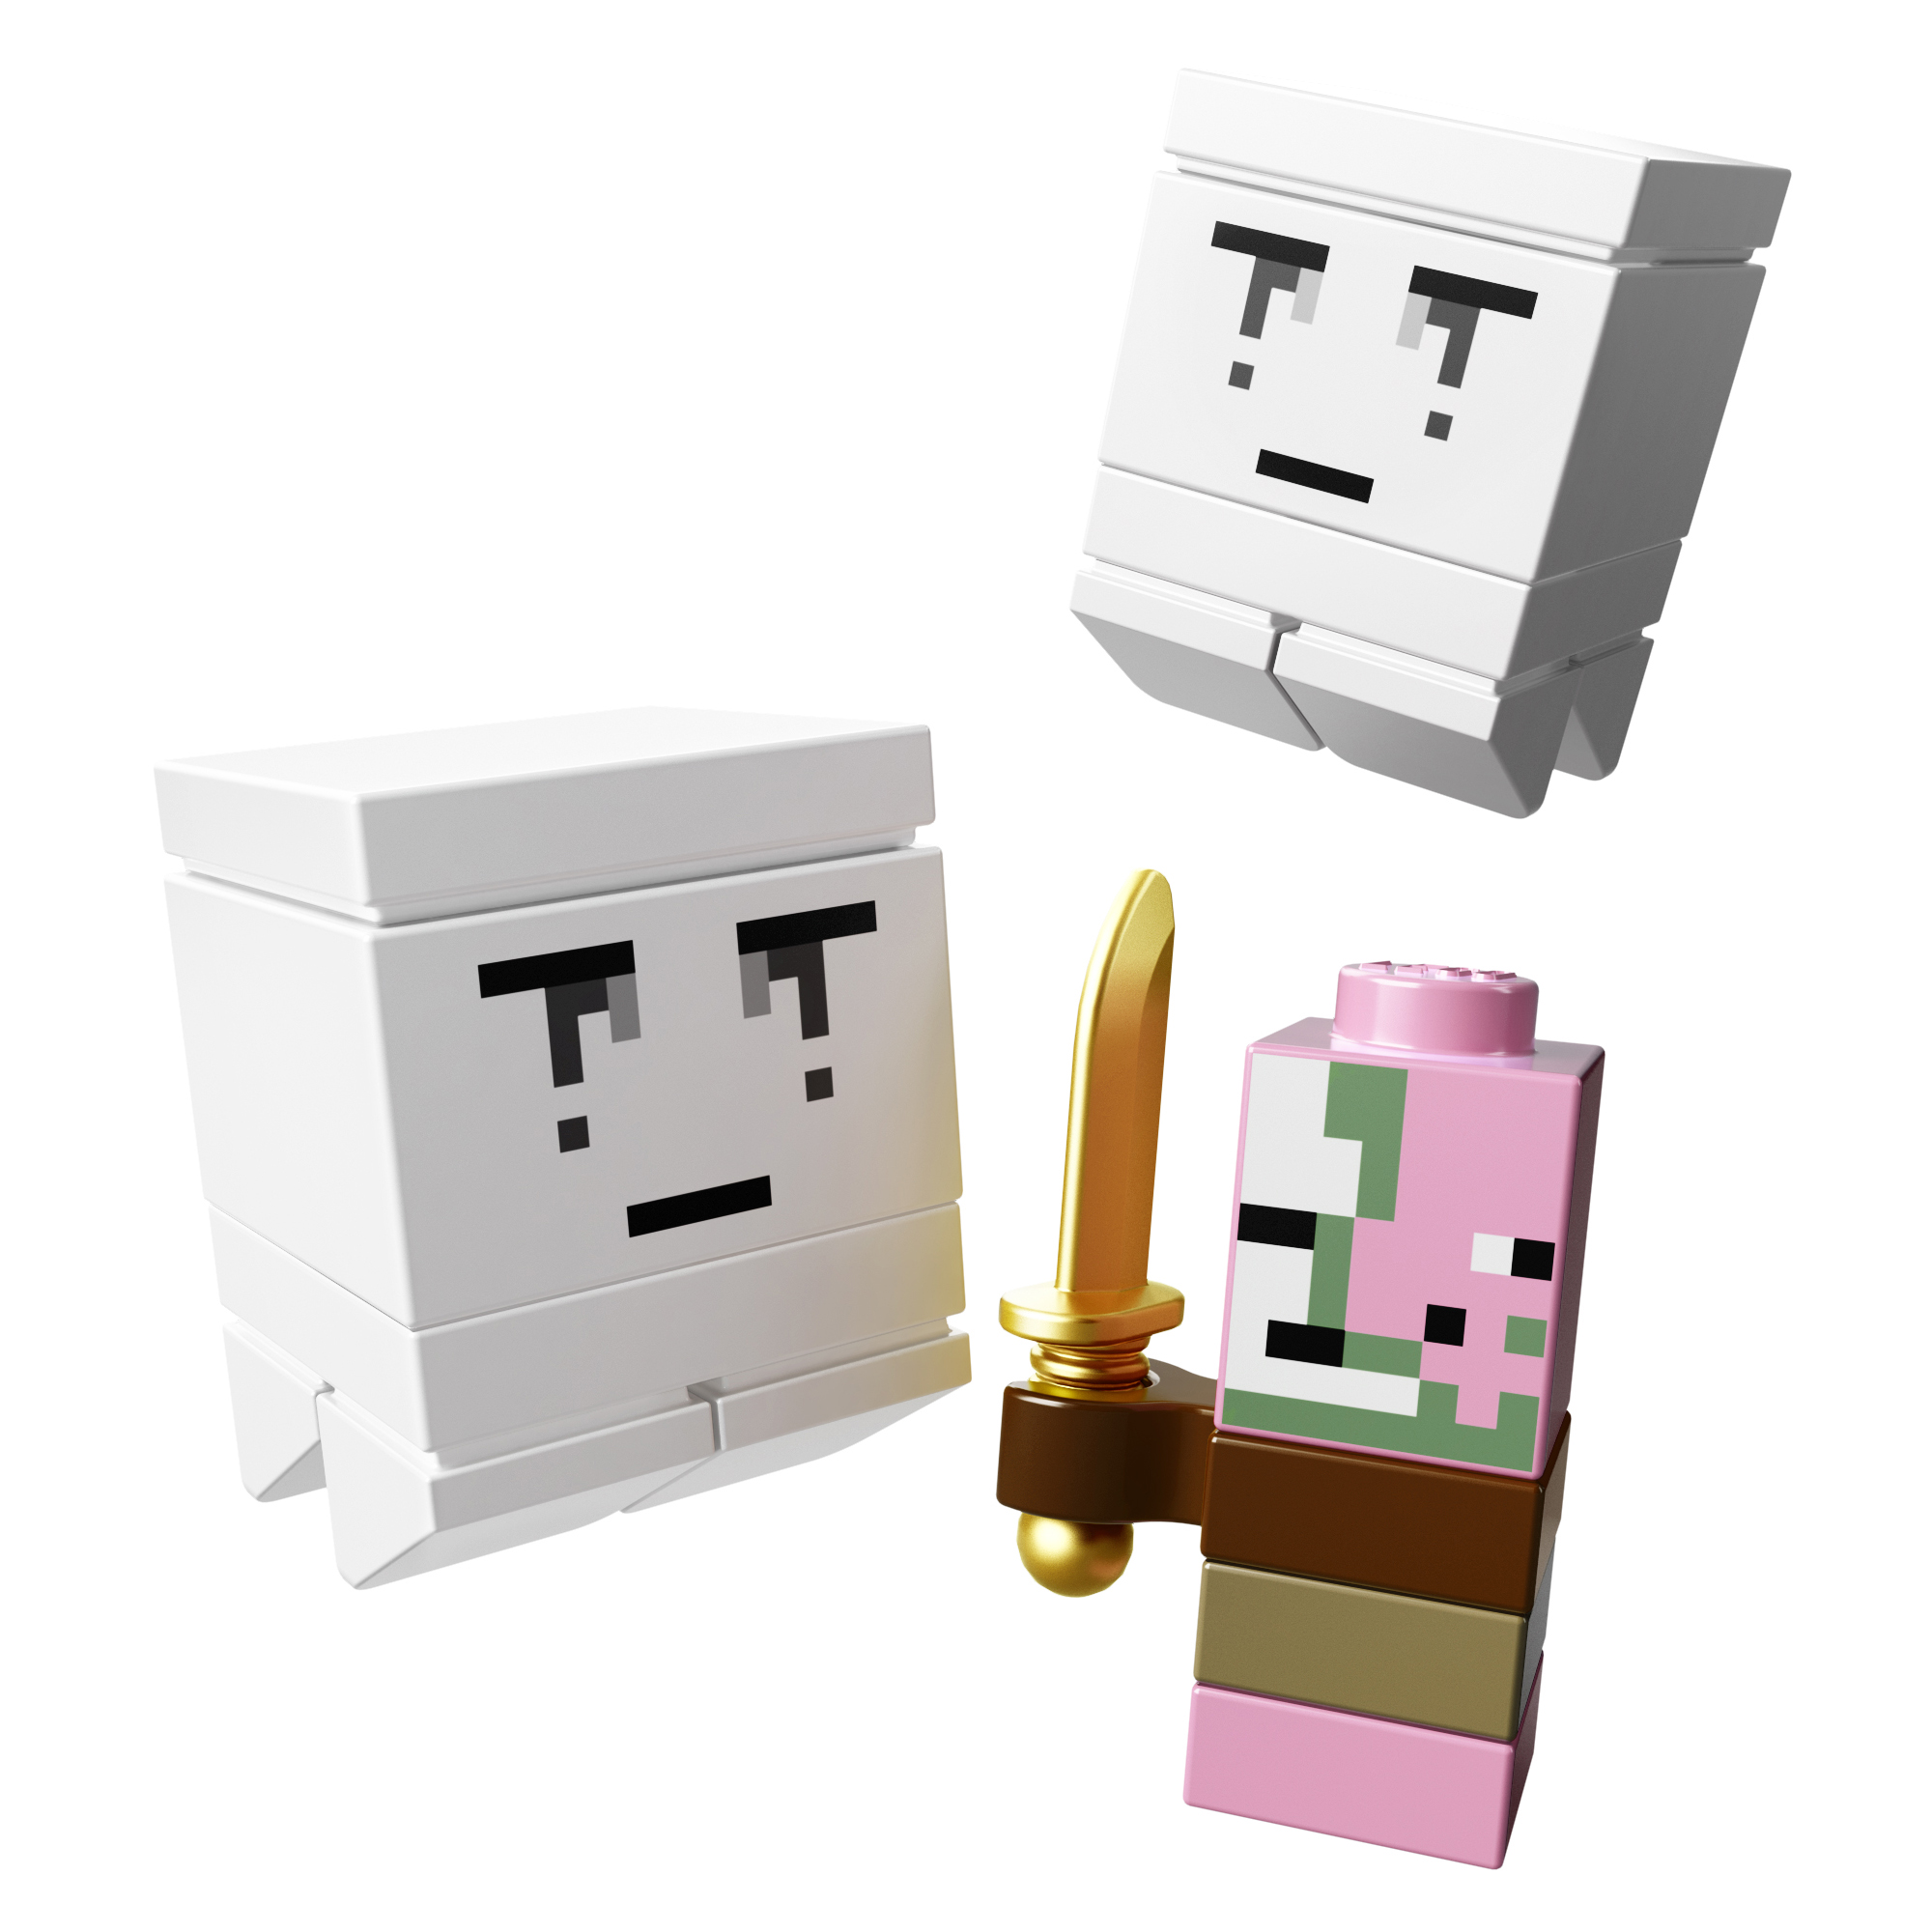 Lego mini figure 1 White Minecraft Ghast 21106 NEW